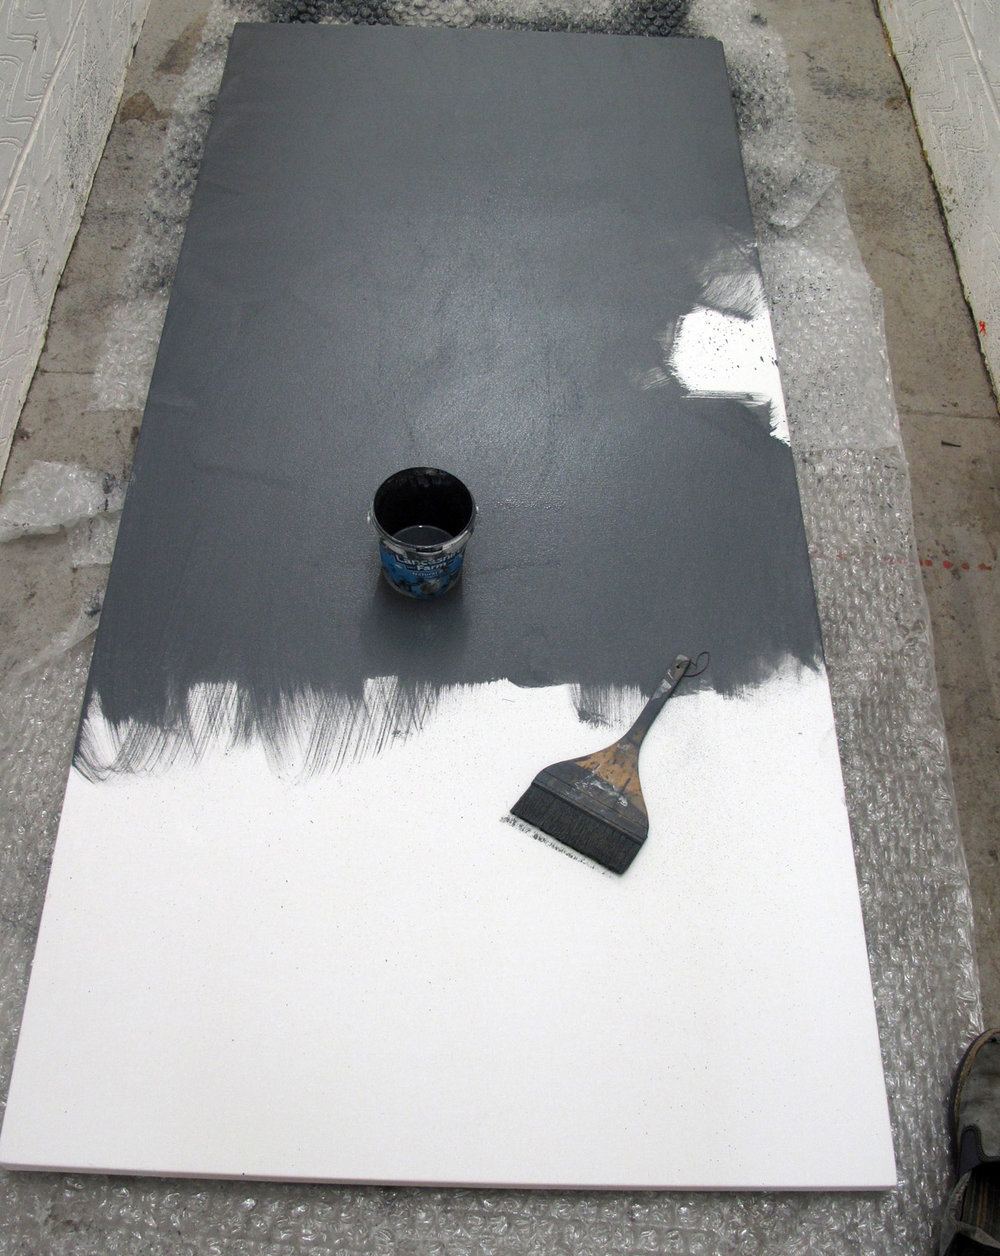 carl-randall-work-in-progress-canvas.jpg